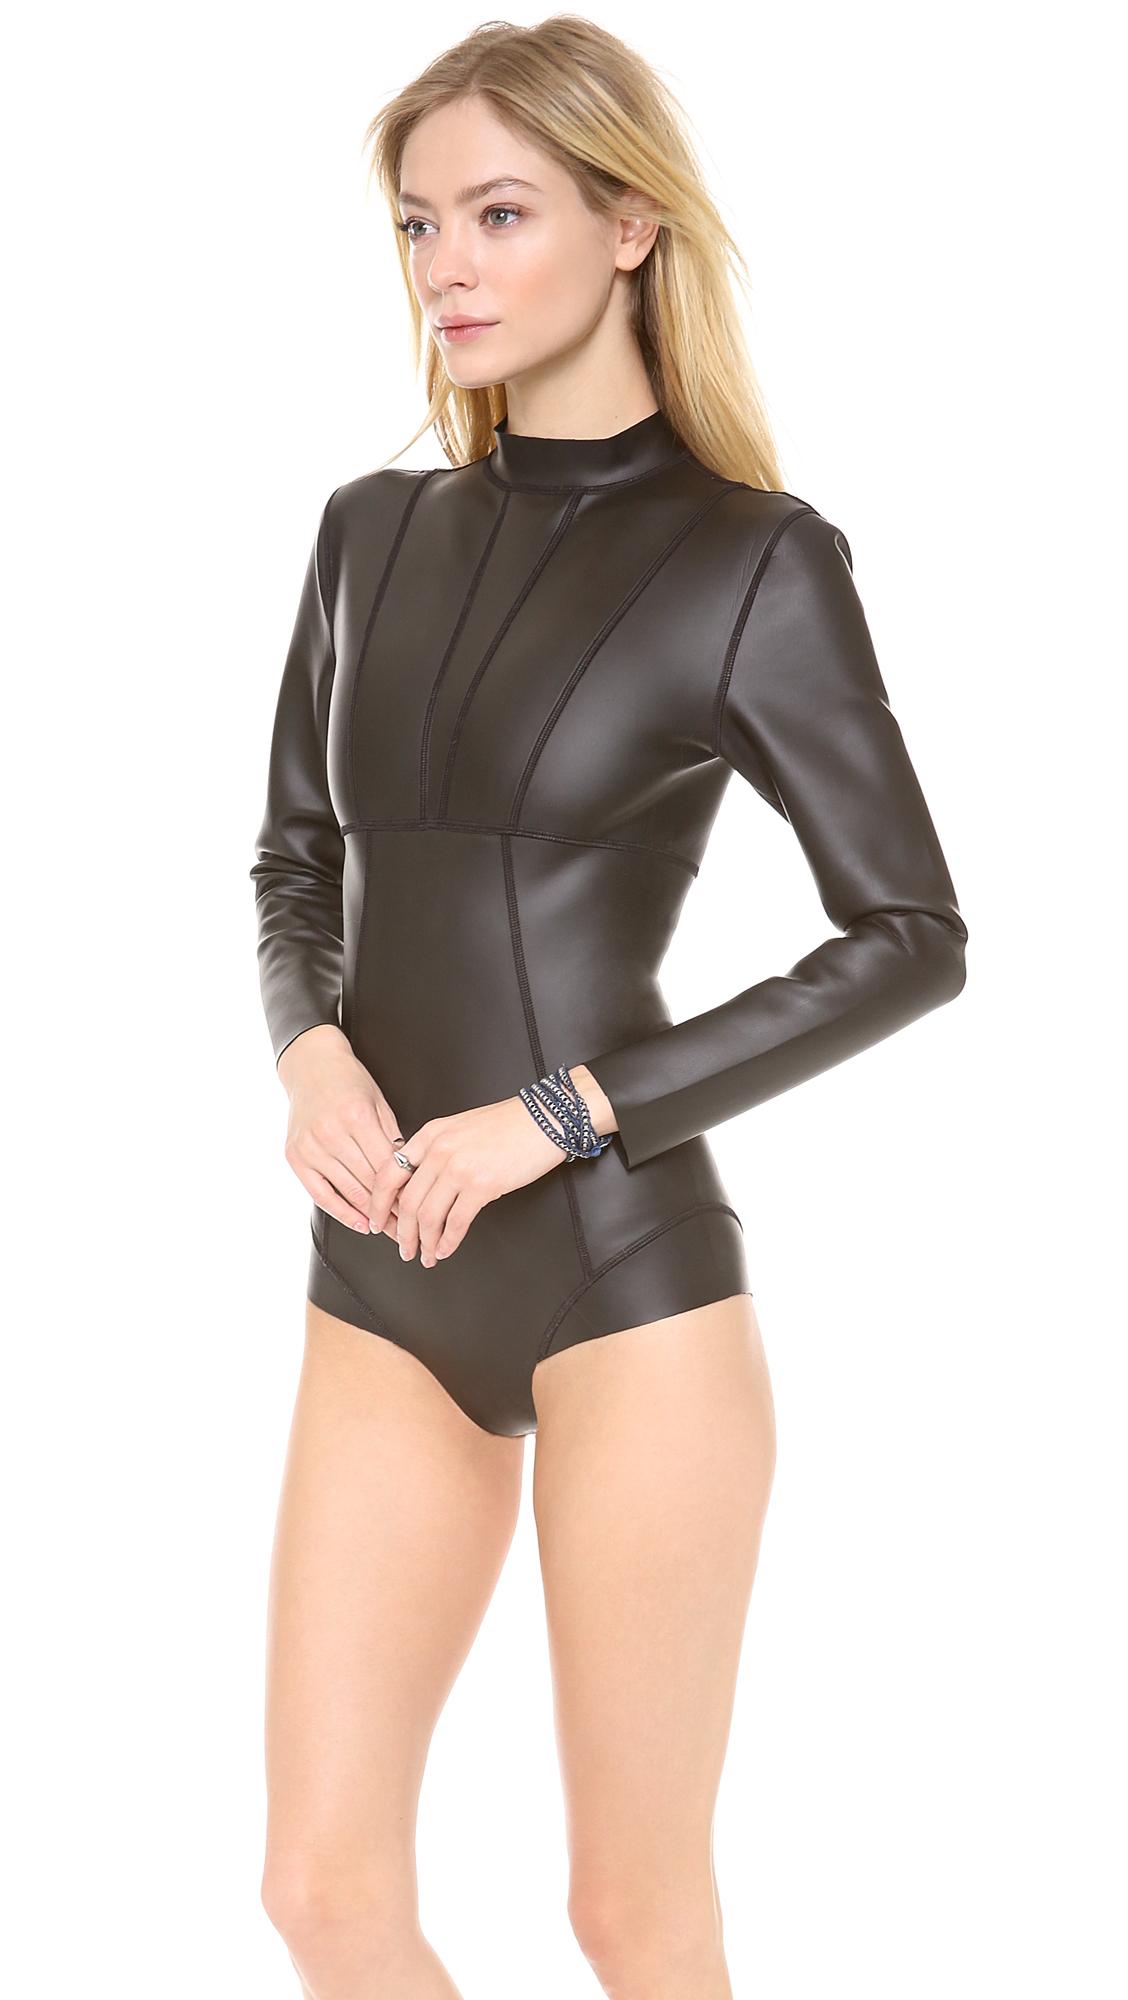 Mikoh Swimwear Banzai Pipeline One Piece Swimsuit In Black